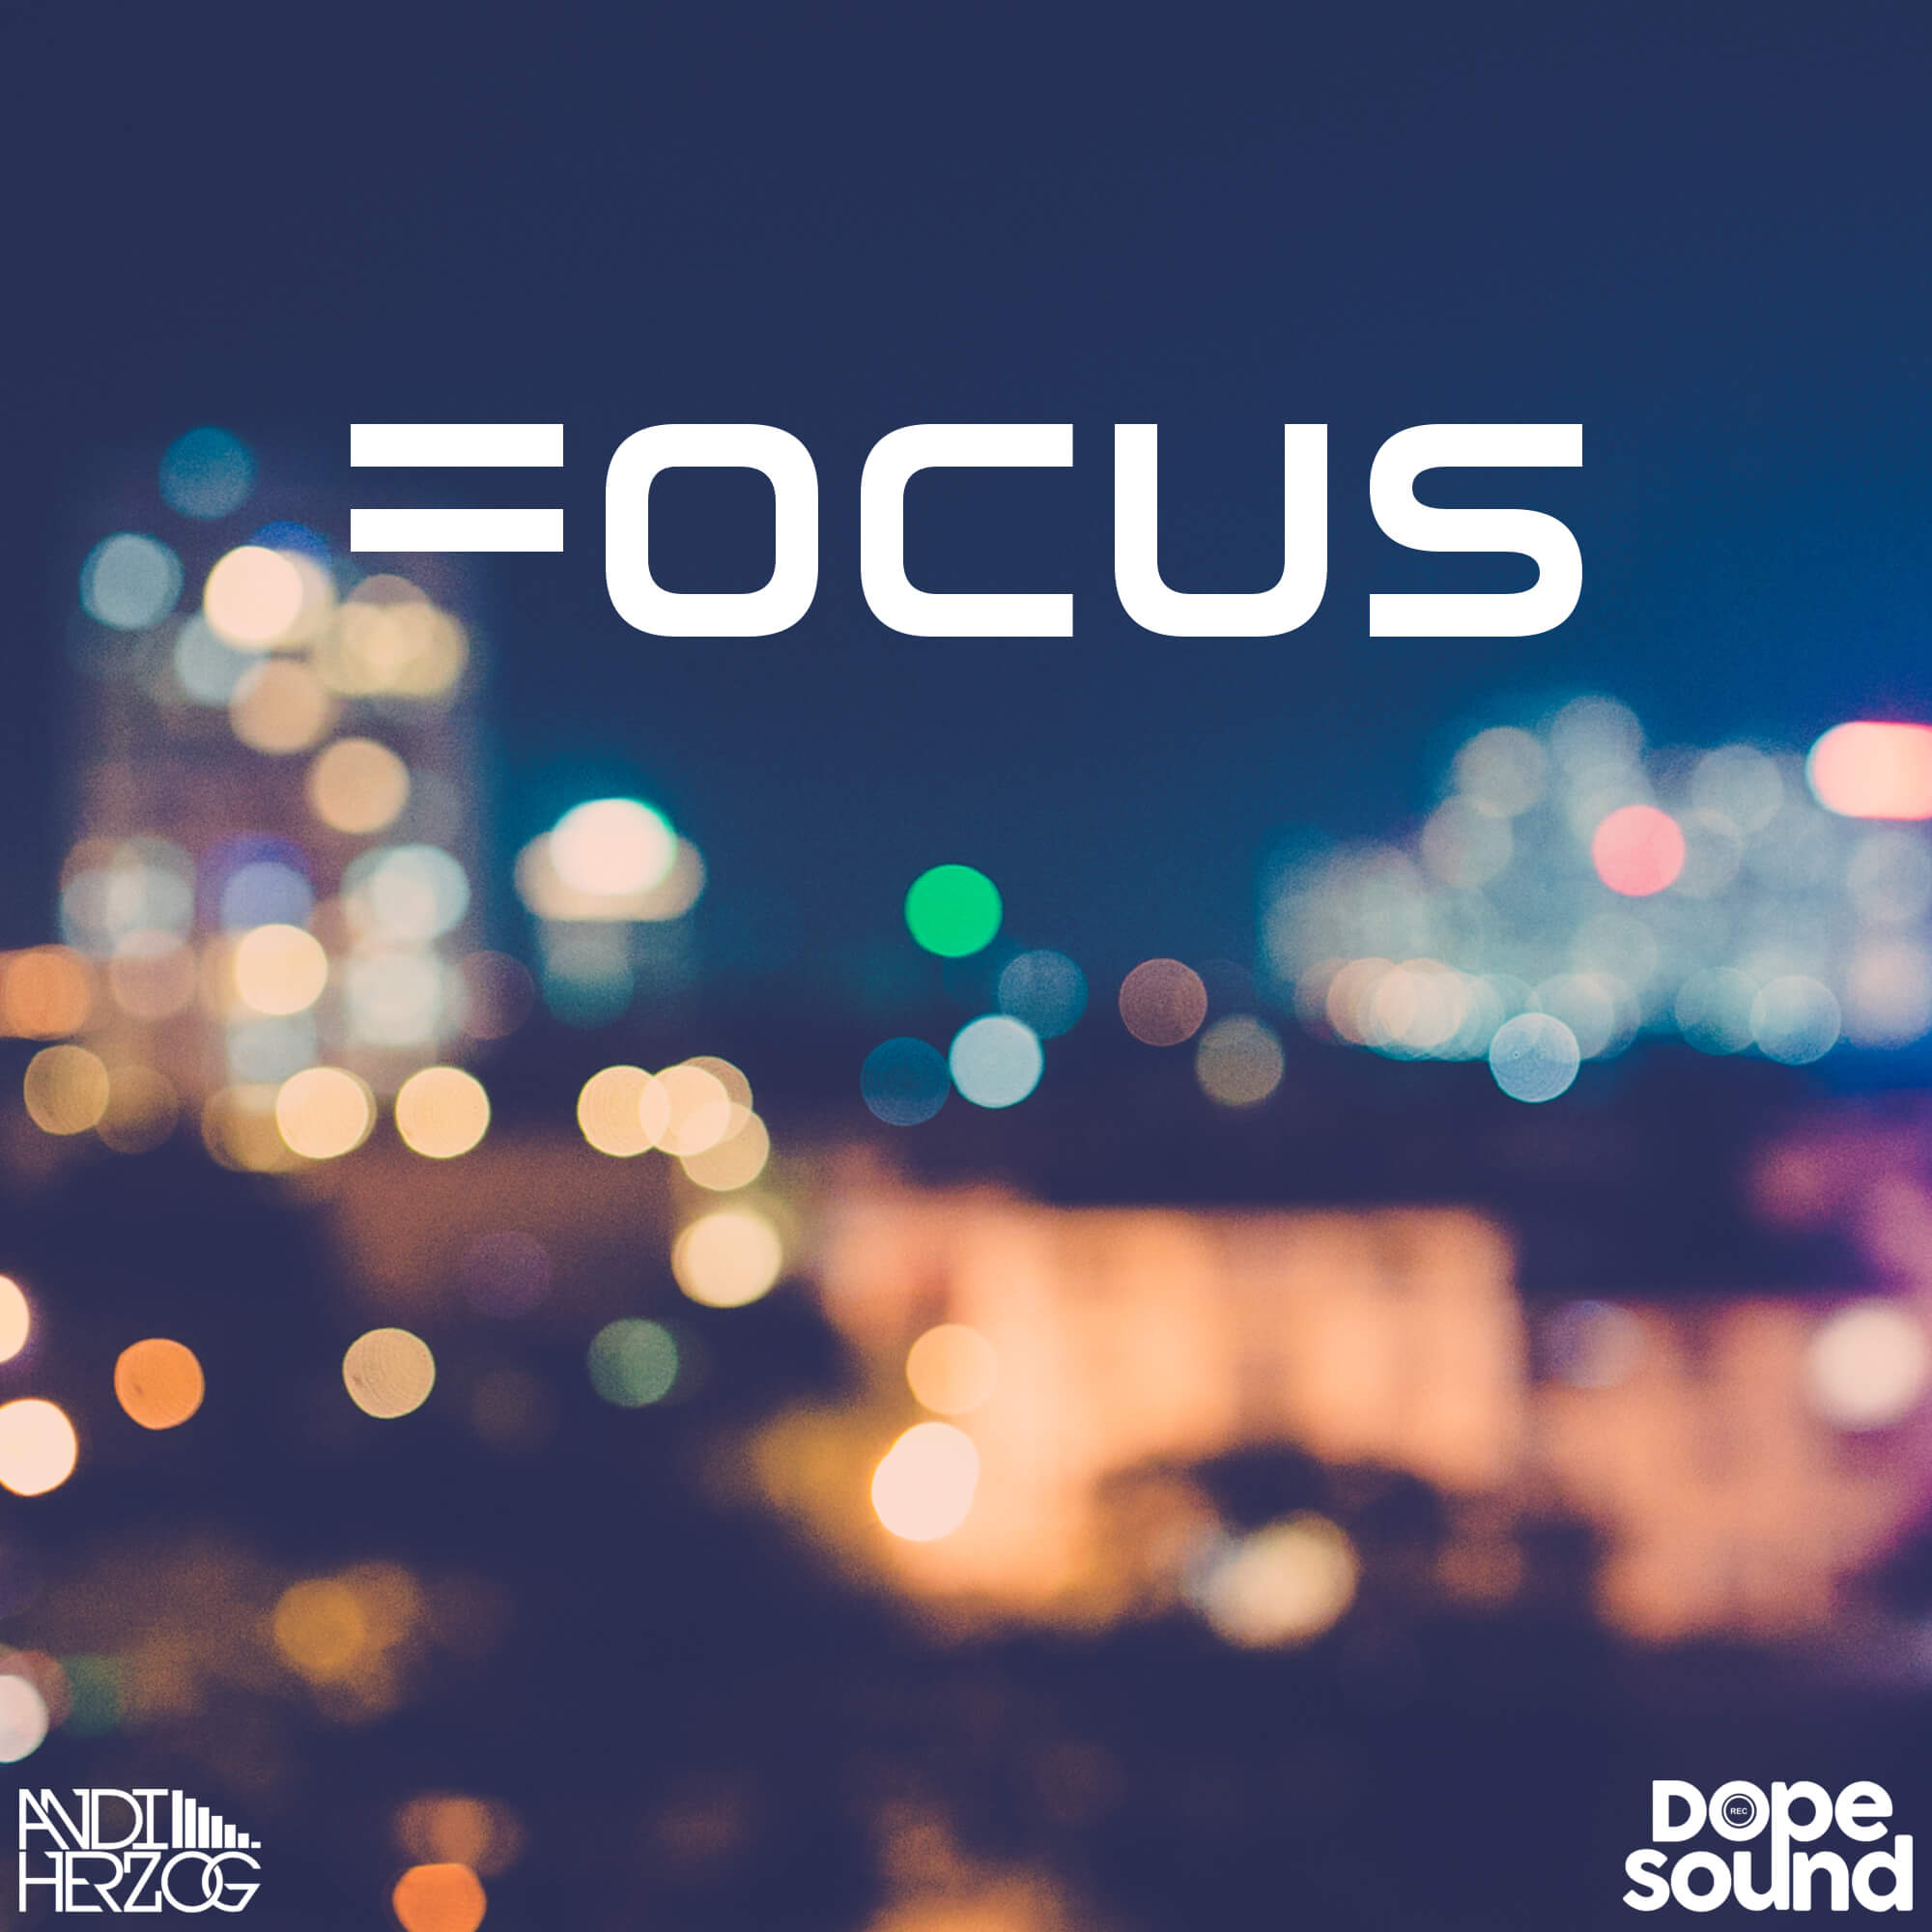 Artwork, Cover - Andi Herzog, Focus, EP, R&B, Hip-Hop, RnB, Ravensburg, Dope Sound, Album